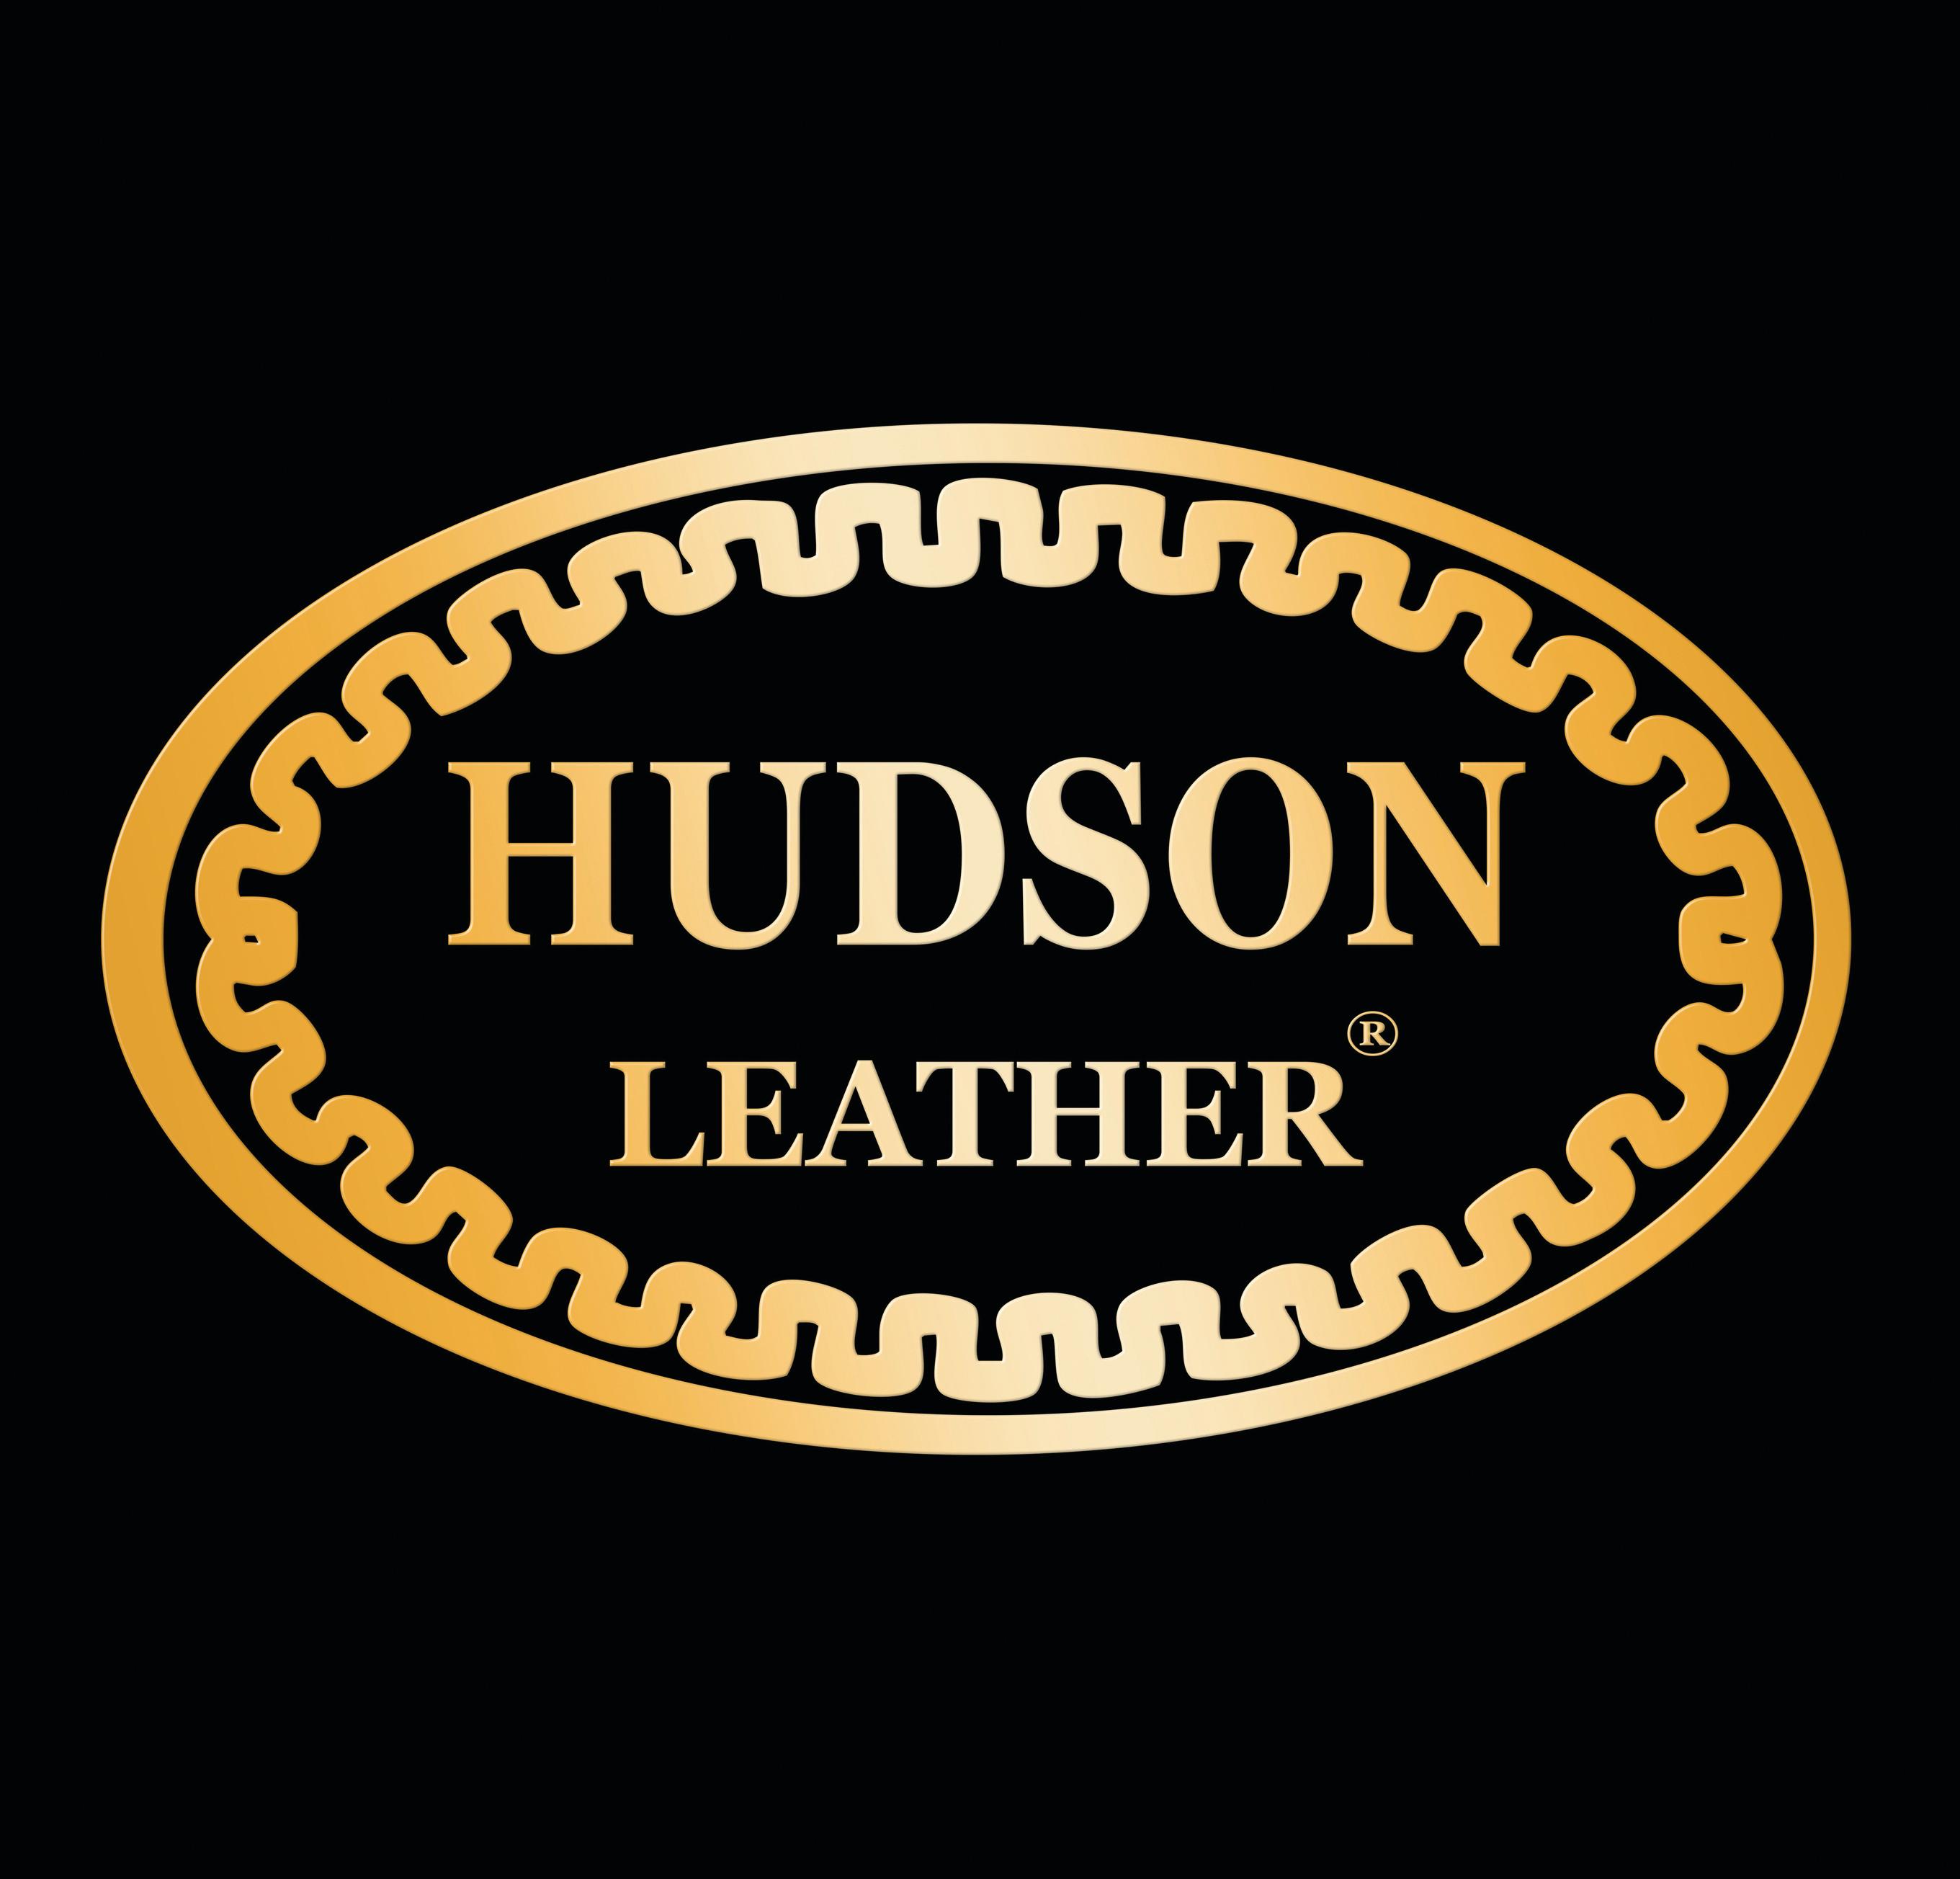 HUDSON LEATHER 2013